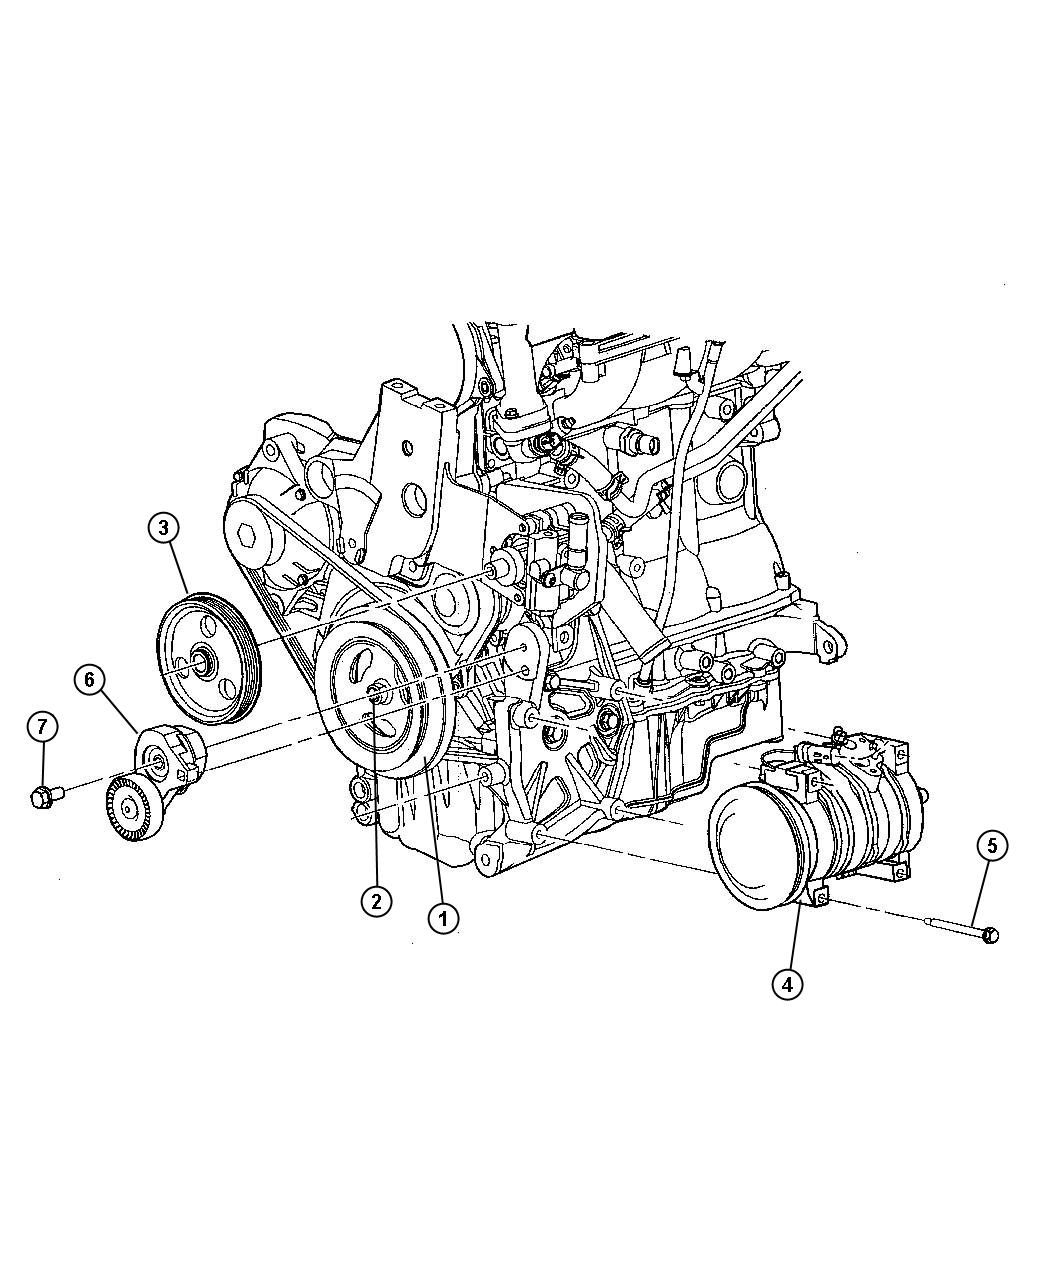 Dodge Neon Bracket, tensioner. Belt. Engine, dohc, turbo